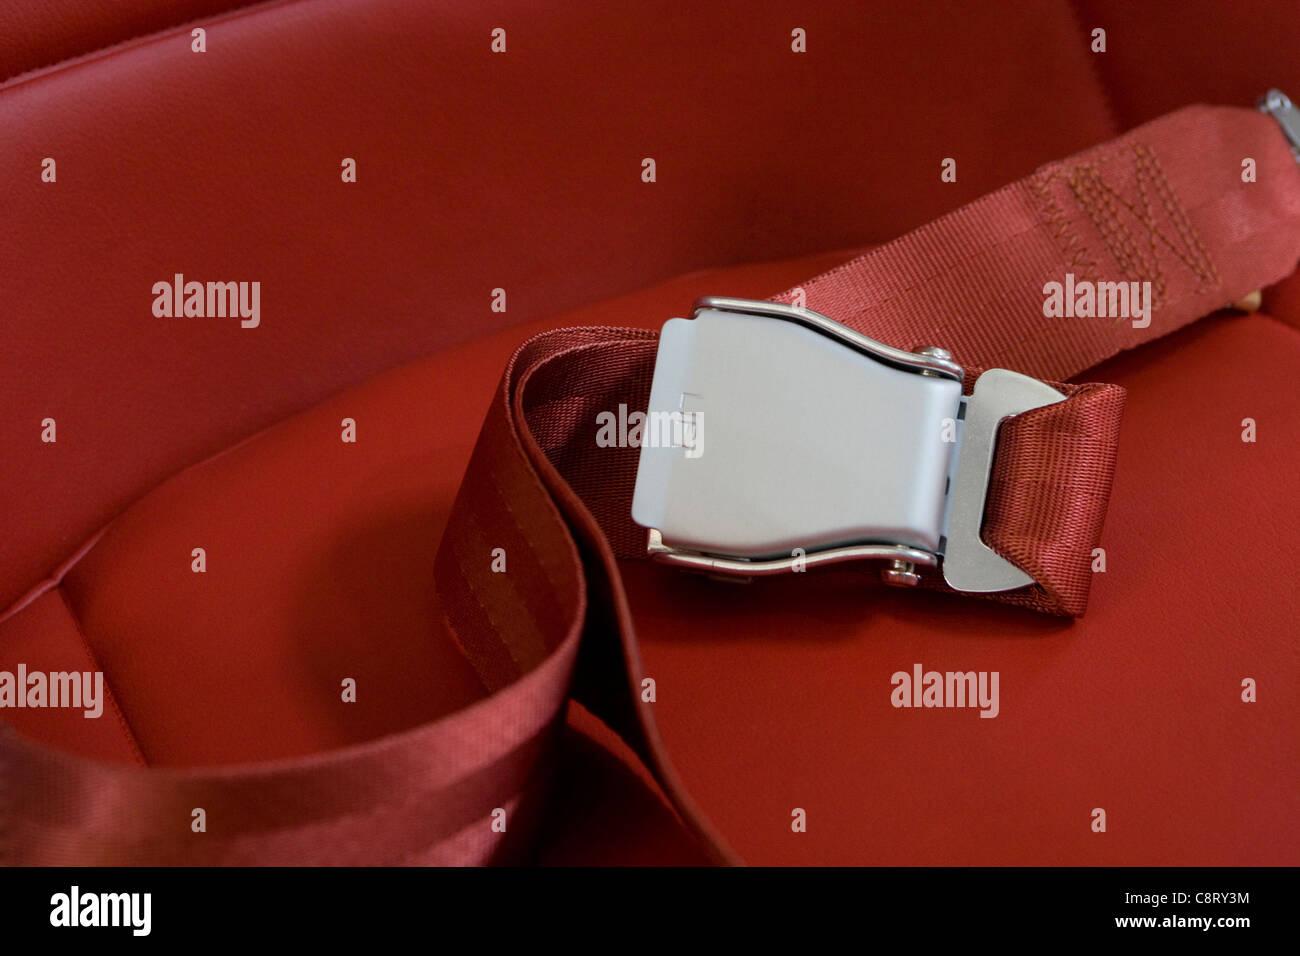 aircraft cabin seat belt - Stock Image